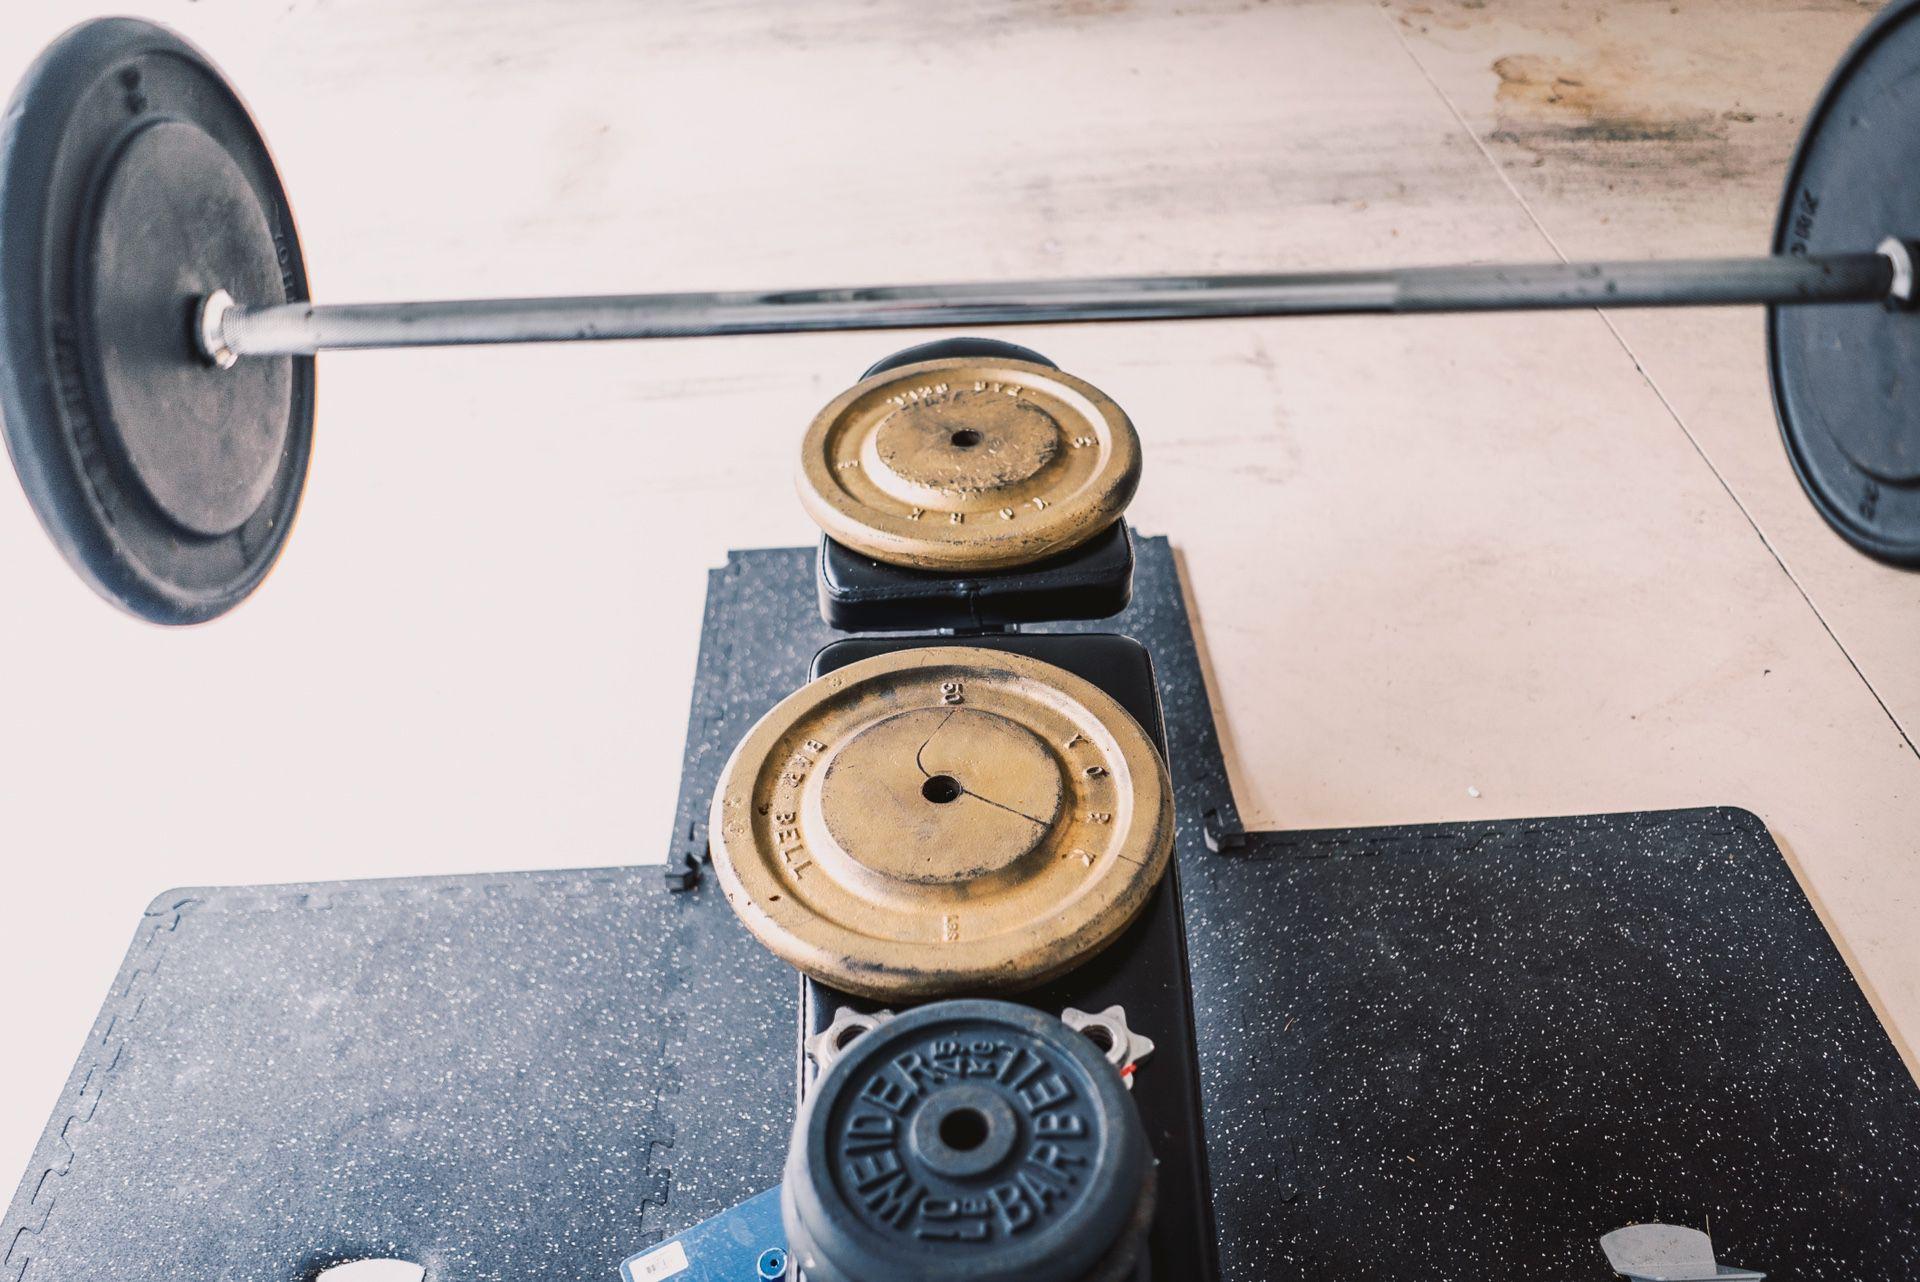 Bench Press Set & Weights